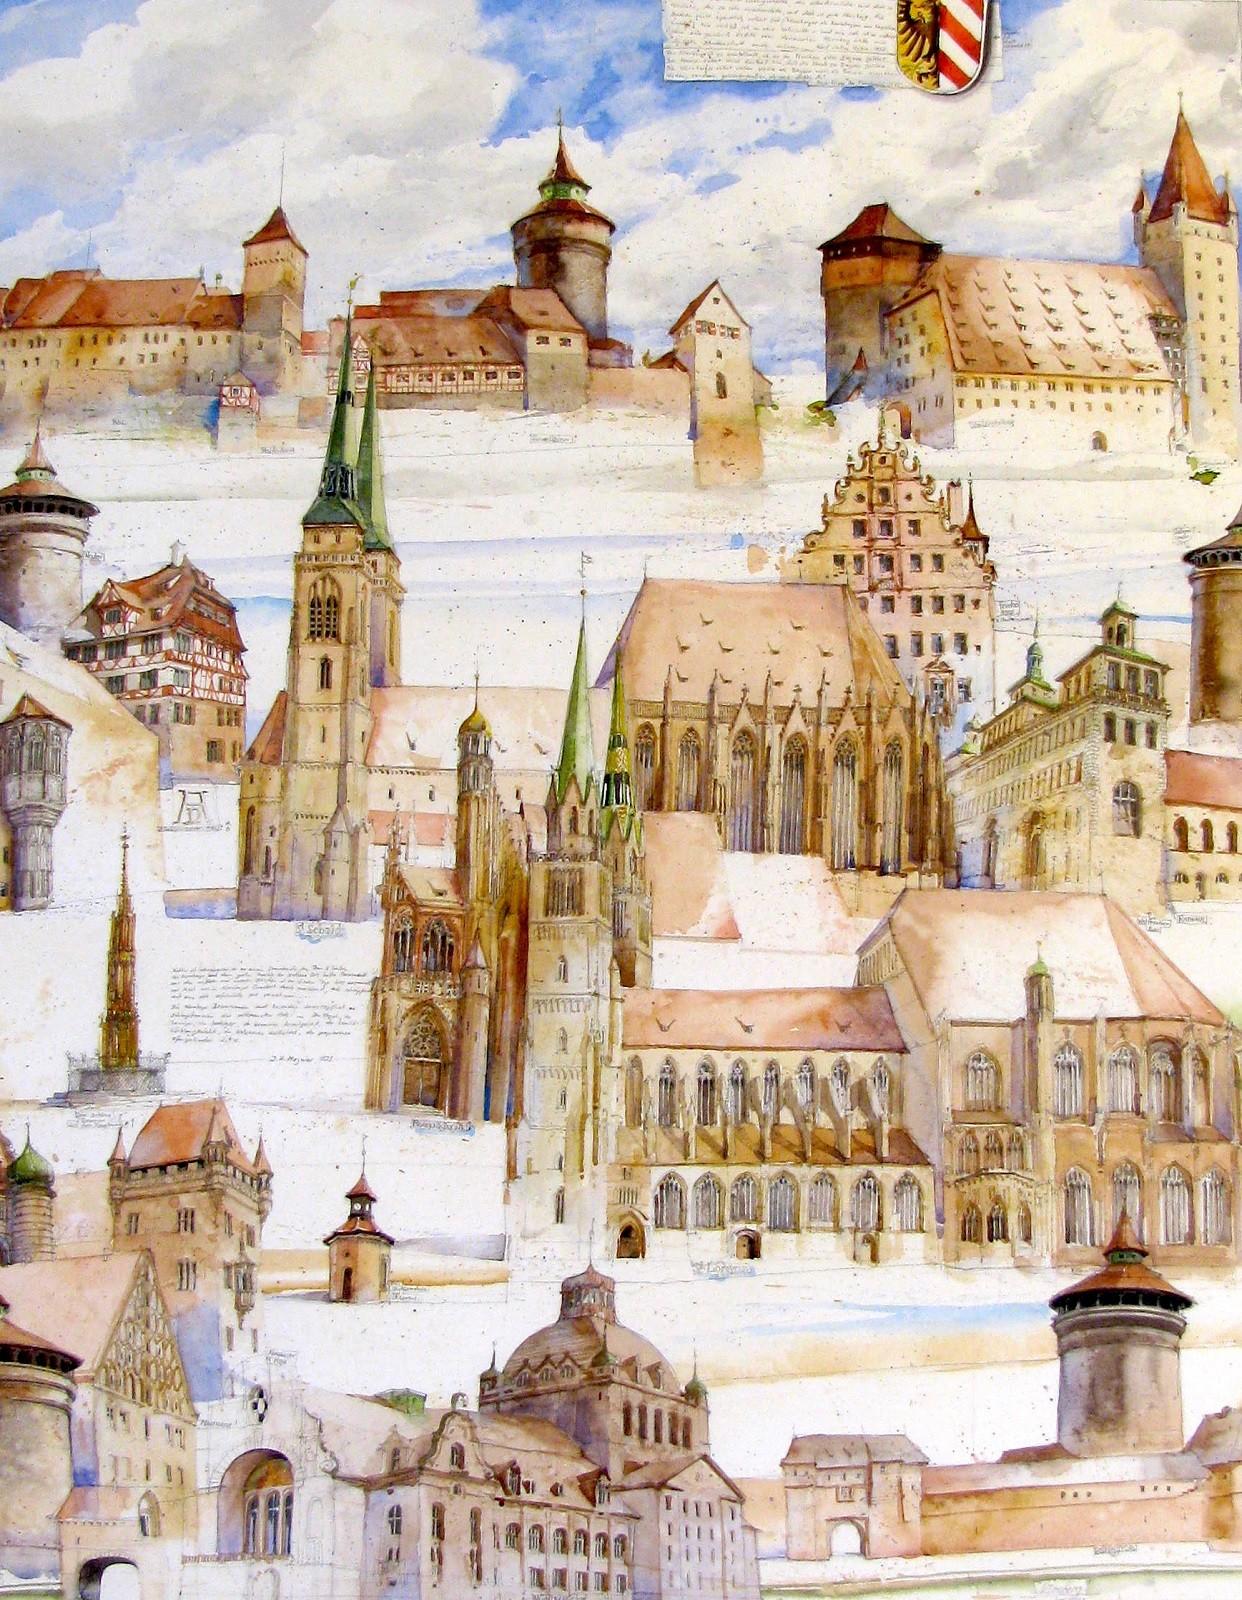 Rore, Robert, Kunst, Galerie Voigt, Nürnberg